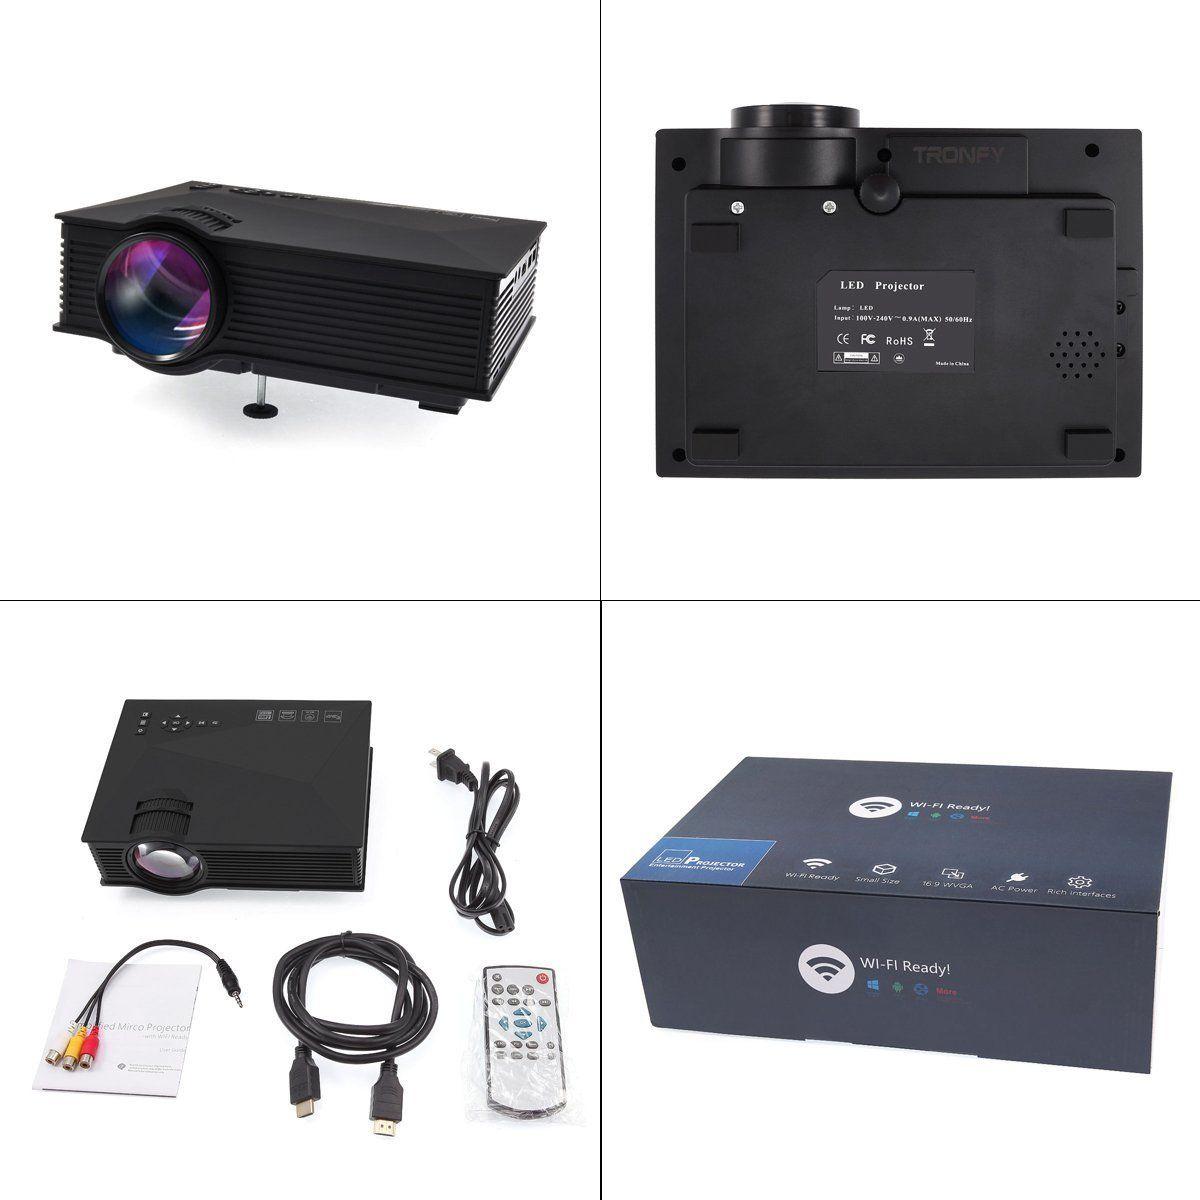 Amazon.com : Tronfy WiFi Wireless 800x480p Full Color 130\